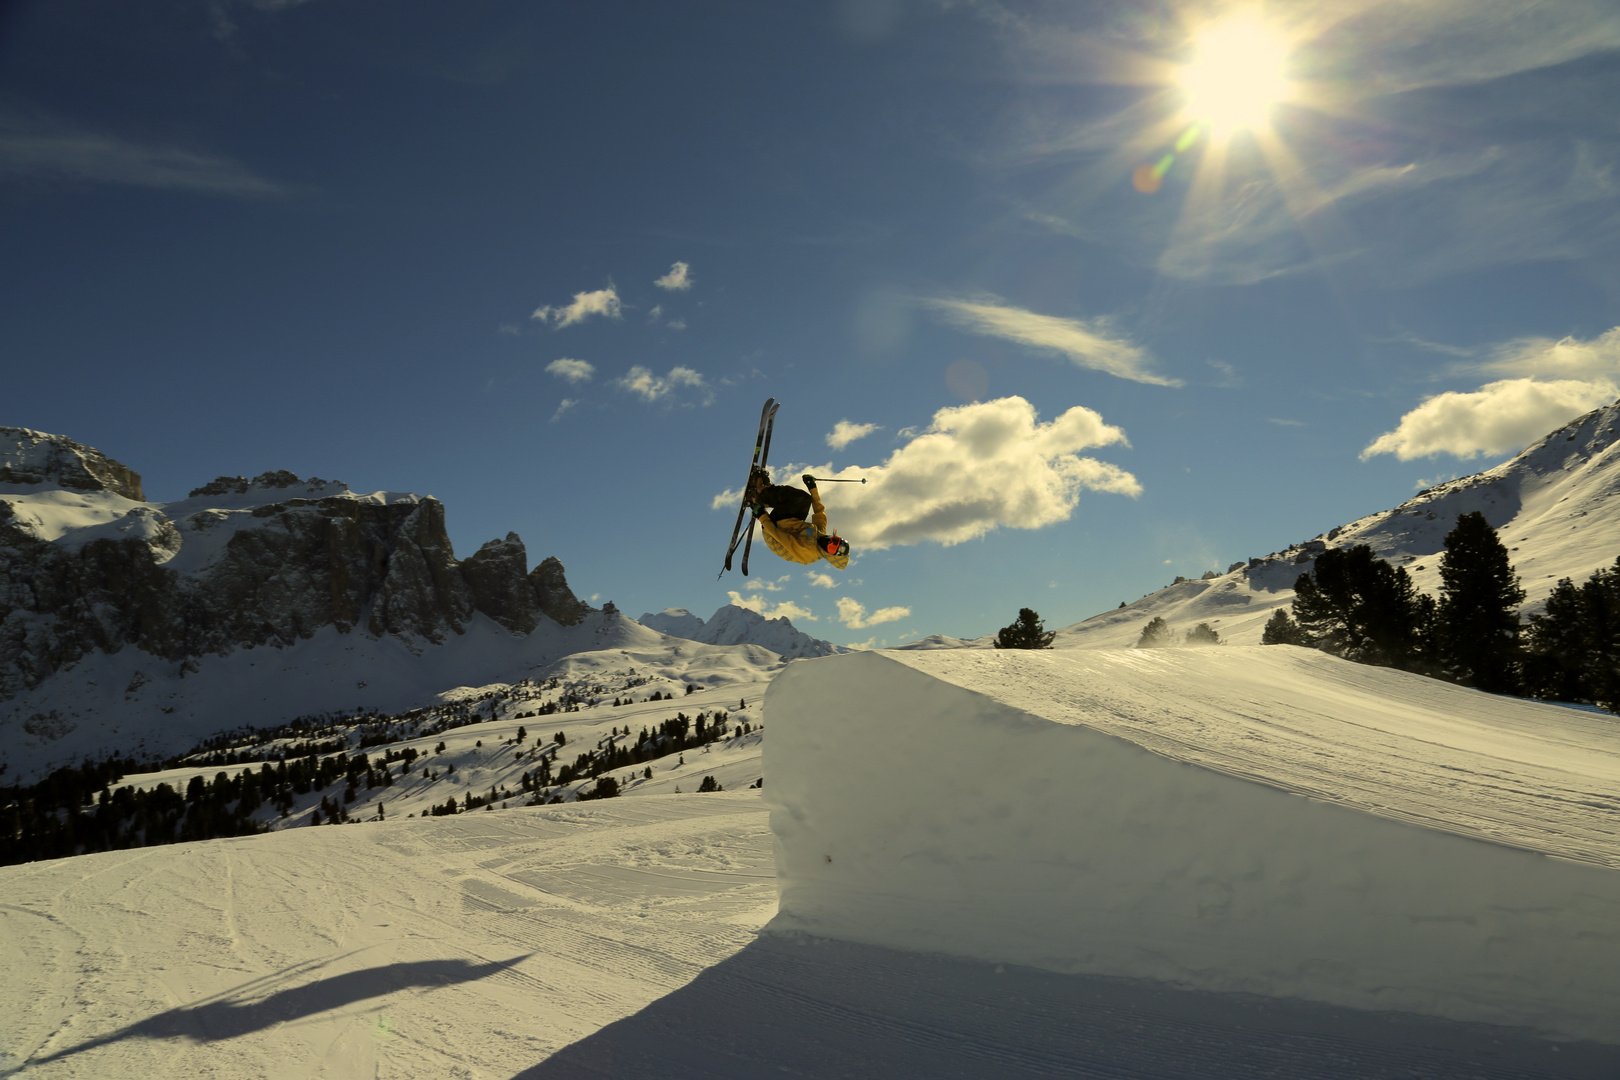 Funpark Dolomites